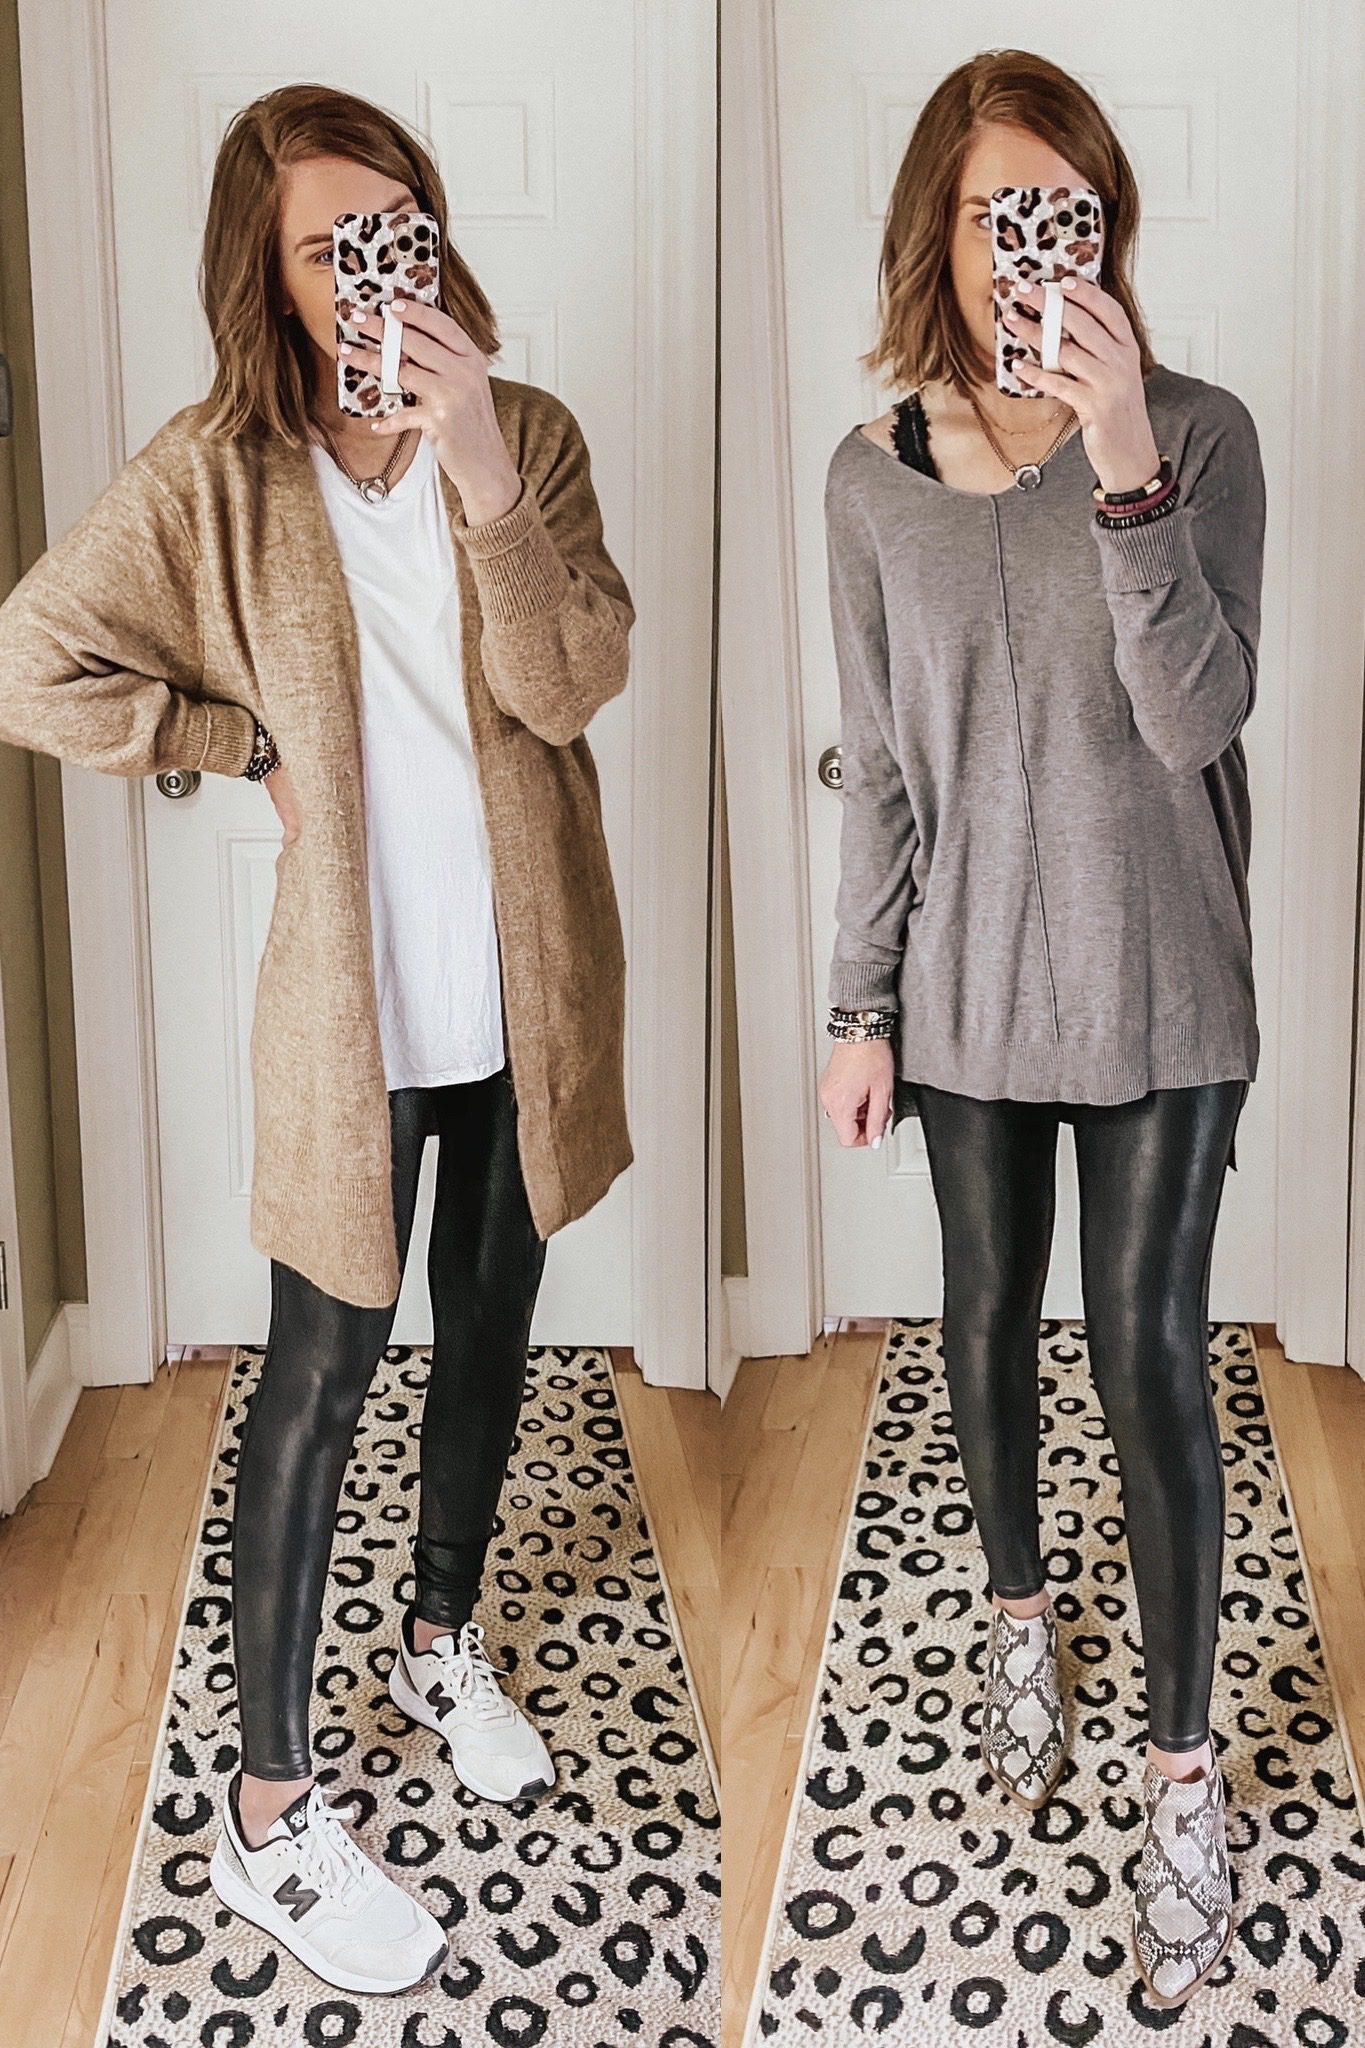 Fall basics, long cardigan, tunic sweater, faux leather leggings outfits